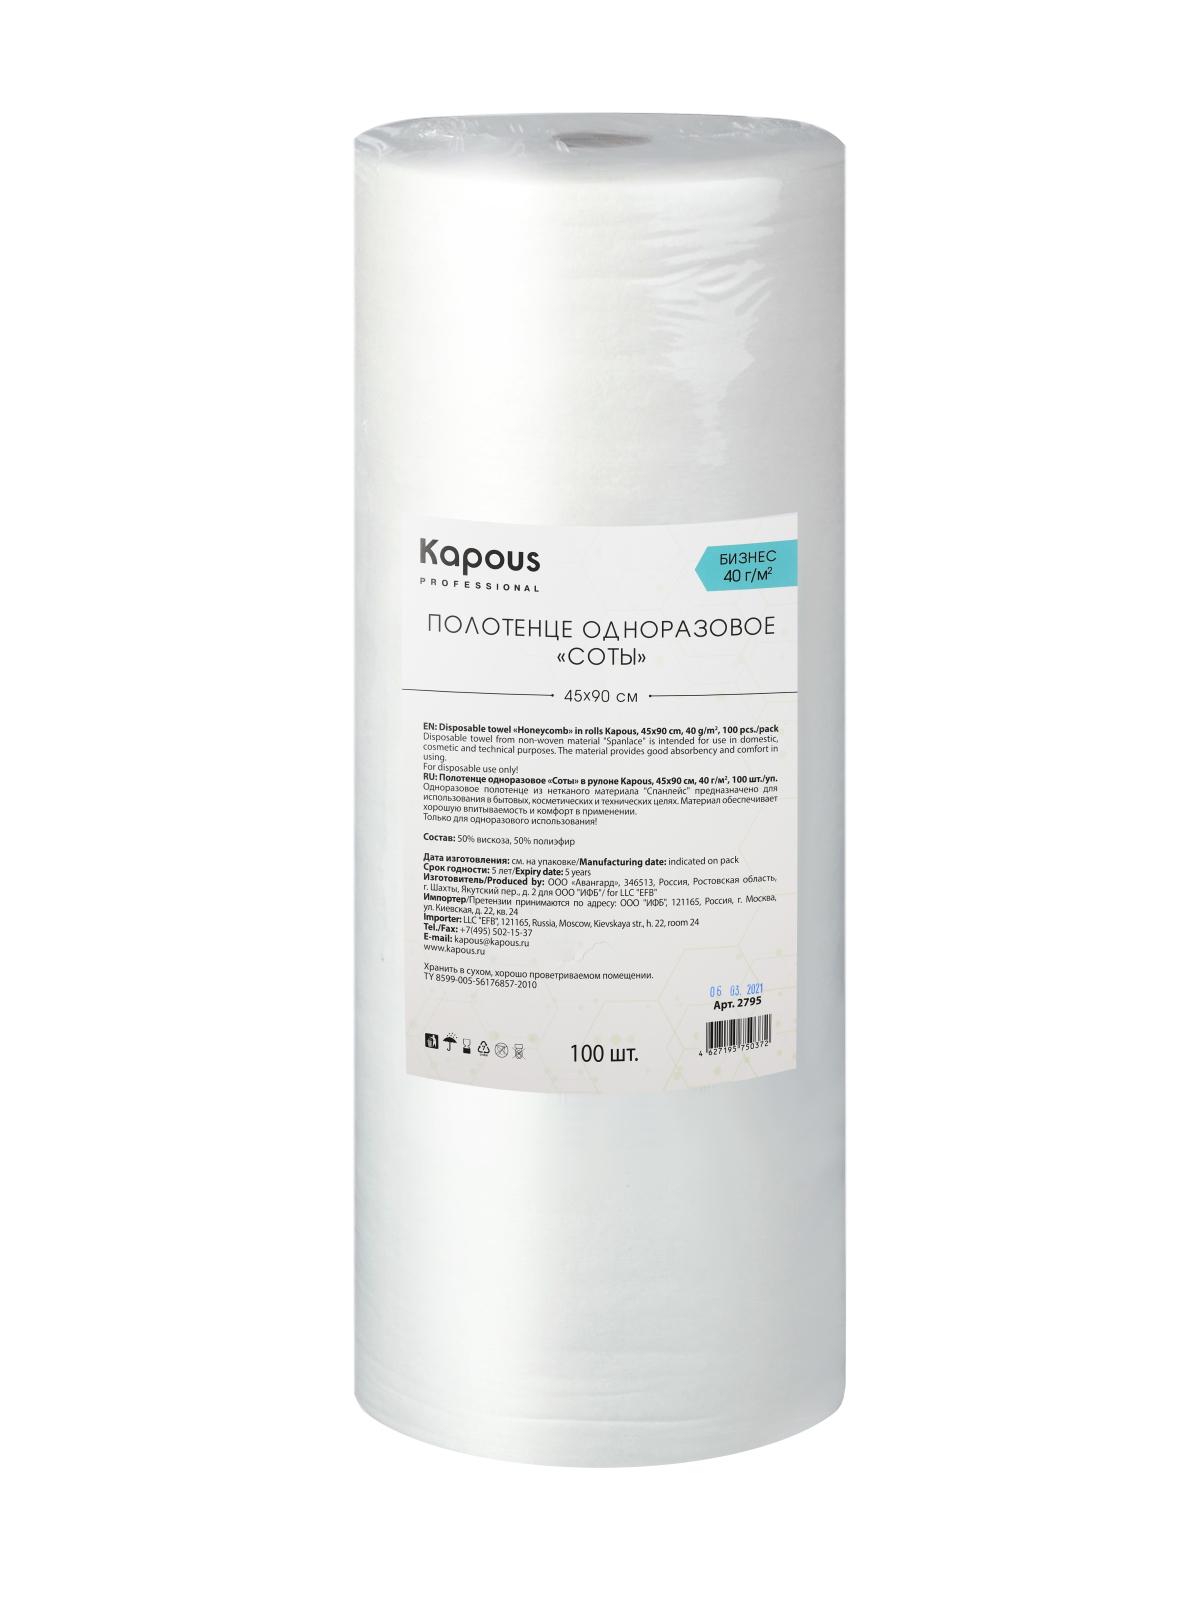 Купить Полотенце одноразовое KAPOUS PROFESSIONAL соты в рулоне 45 х 90 см 40г/м2 100 шт